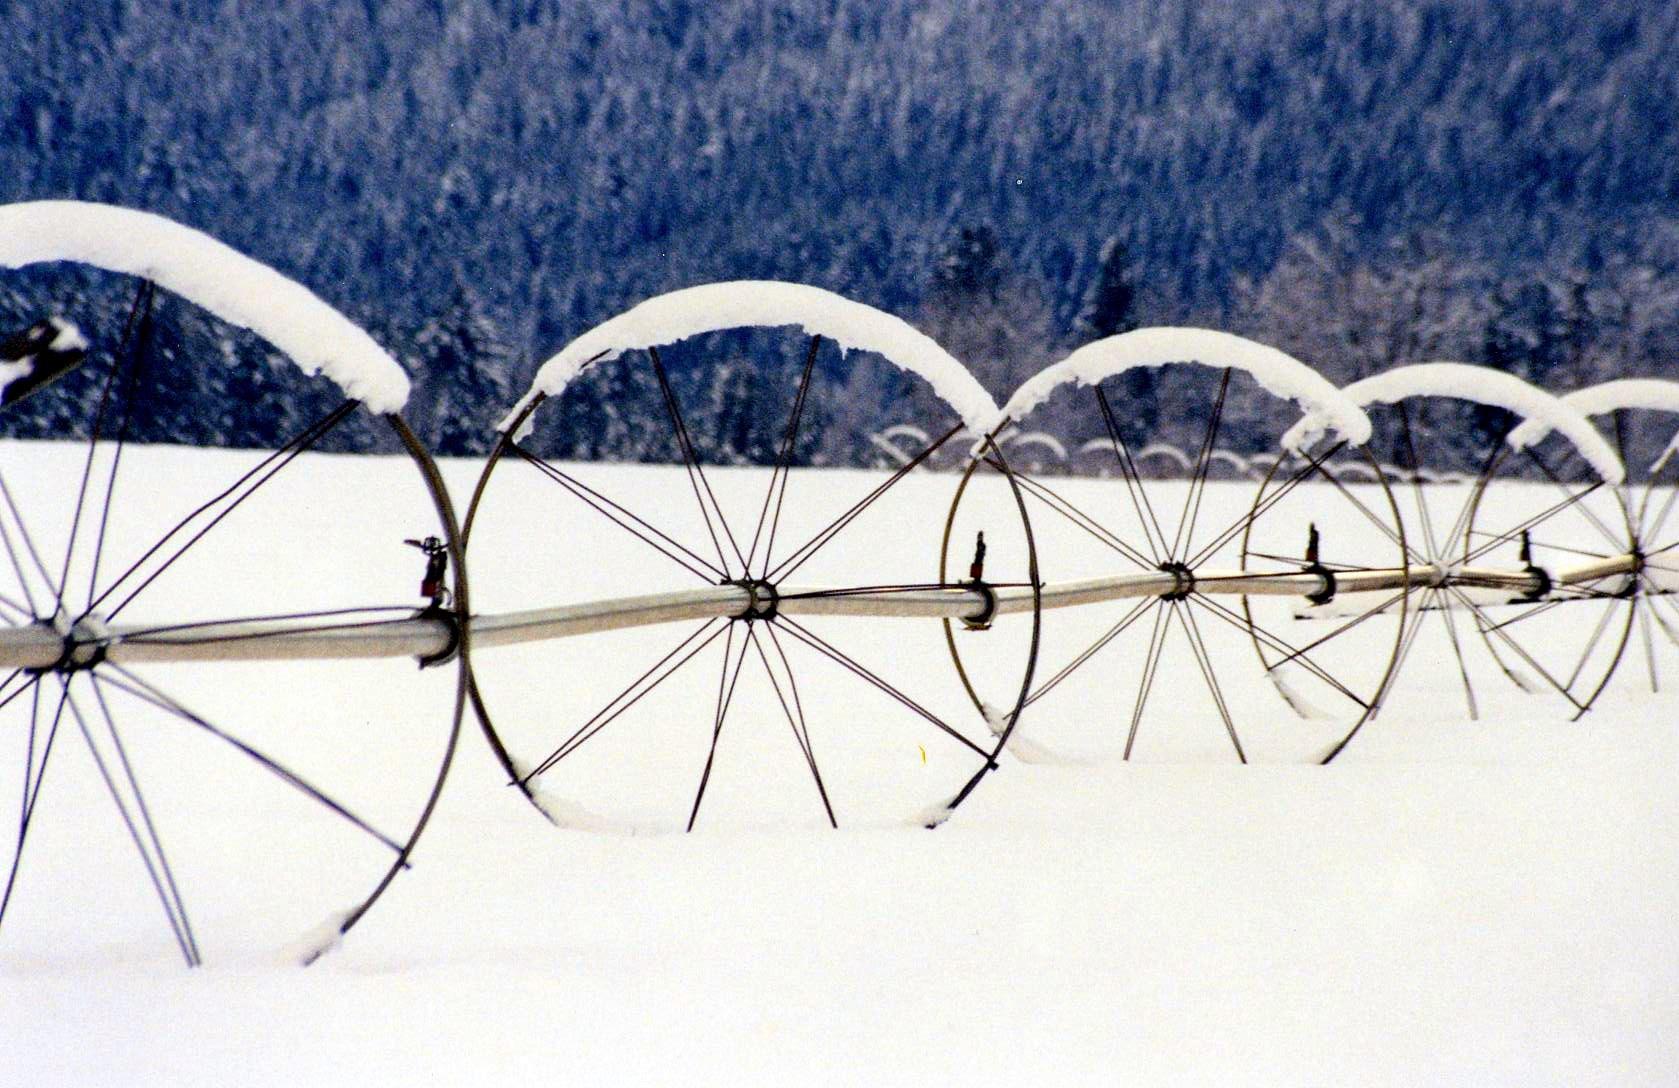 Photo of irrigation wheels with snow, Husum, WA.